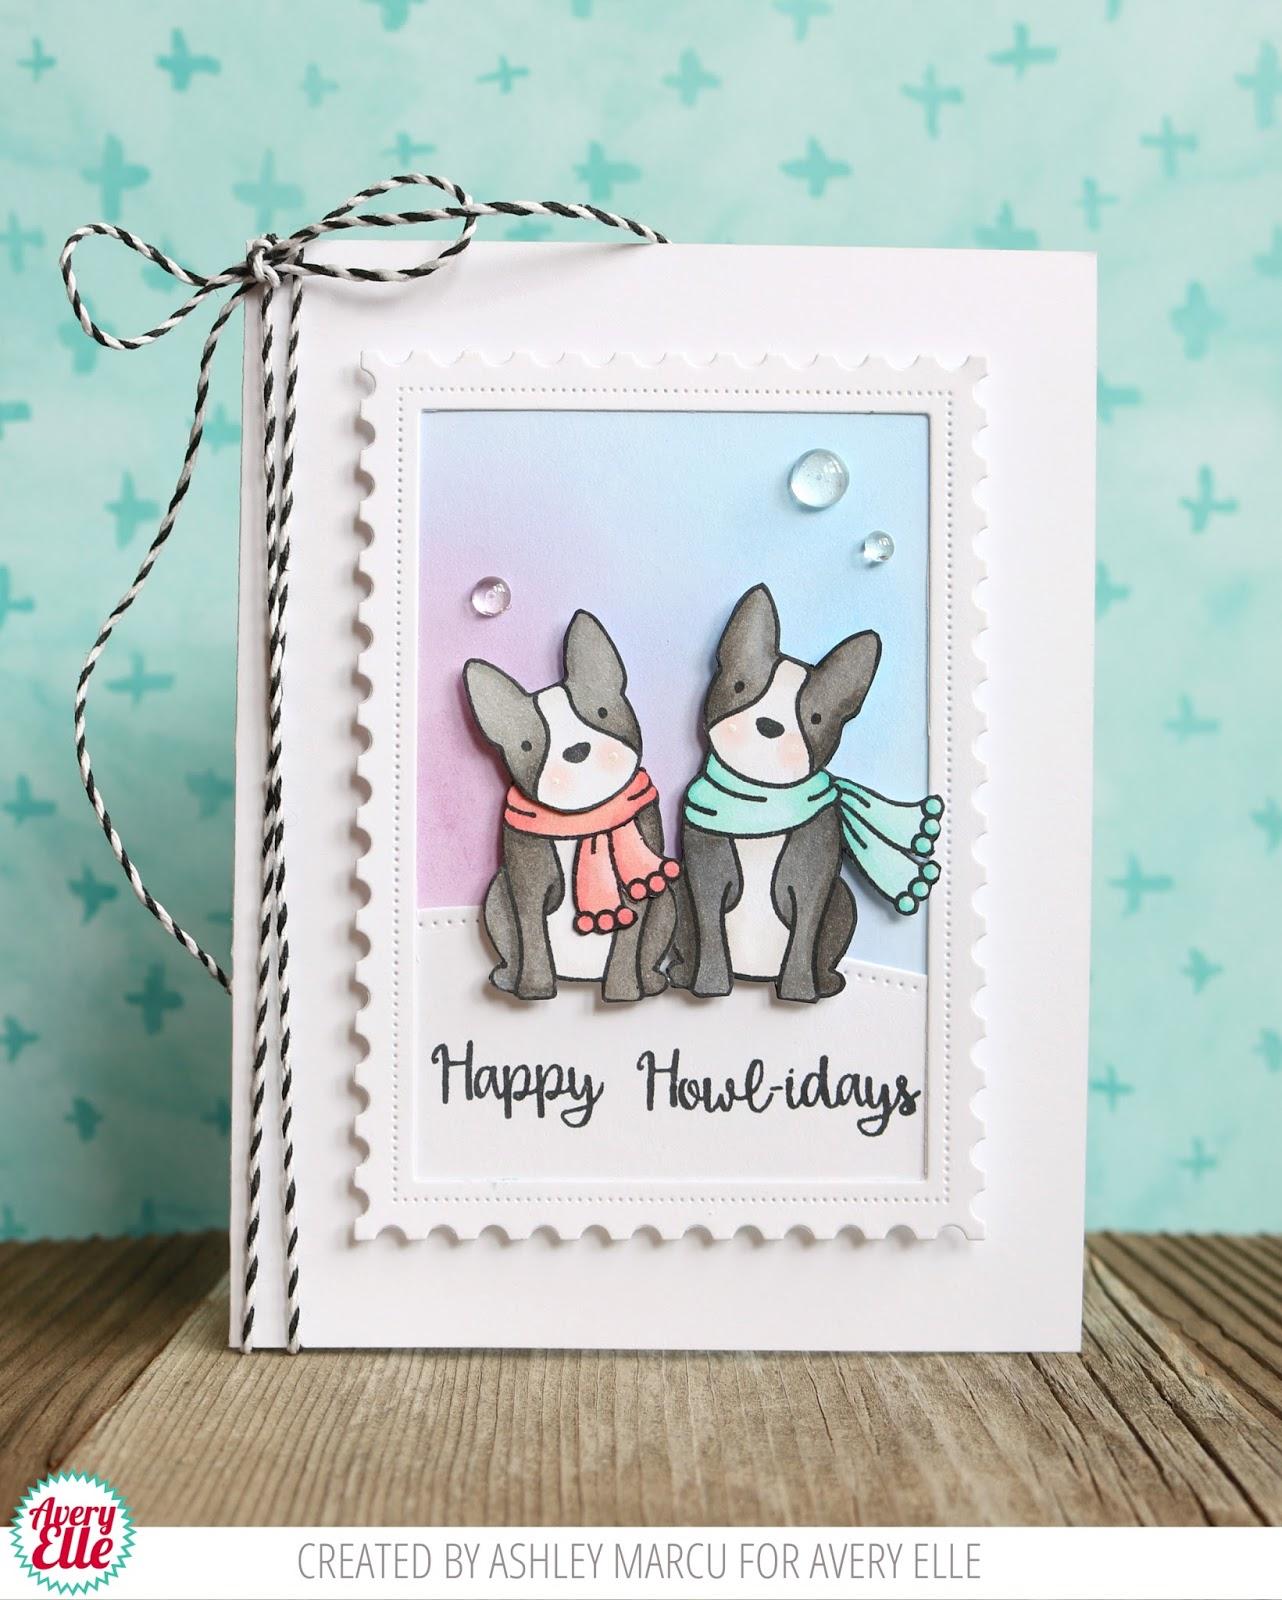 Avery Elle Three Cute Seasonal Cards